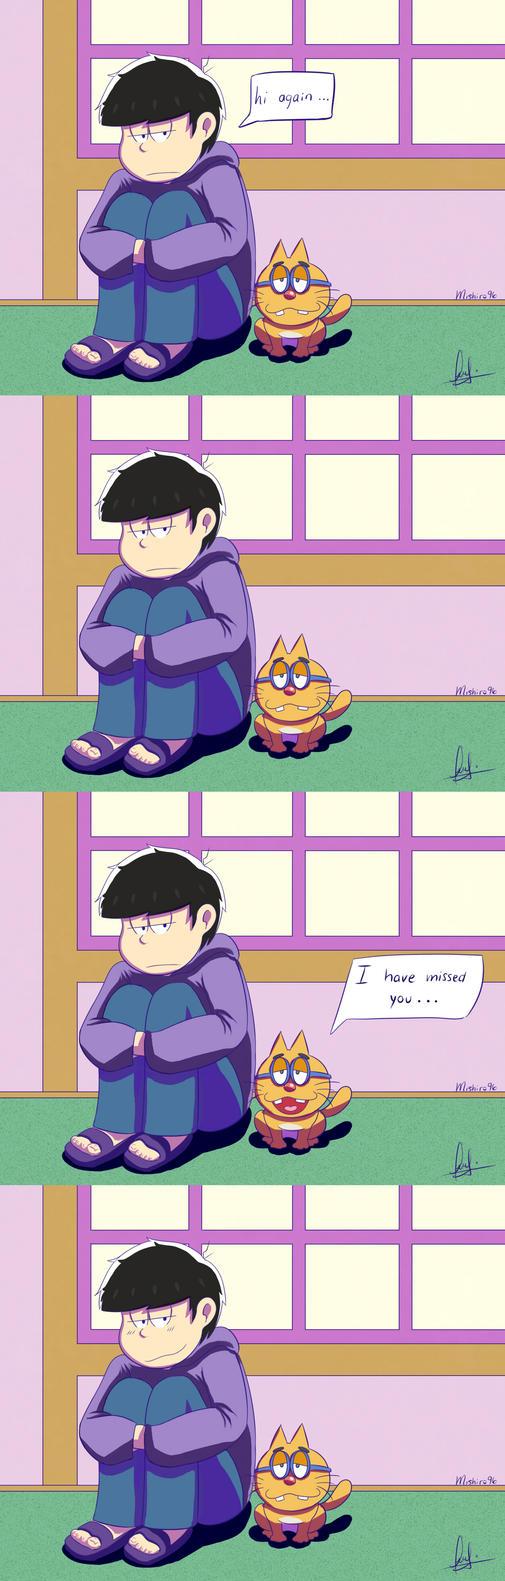 Osomatsu-san Season 2 ! by mishiro96